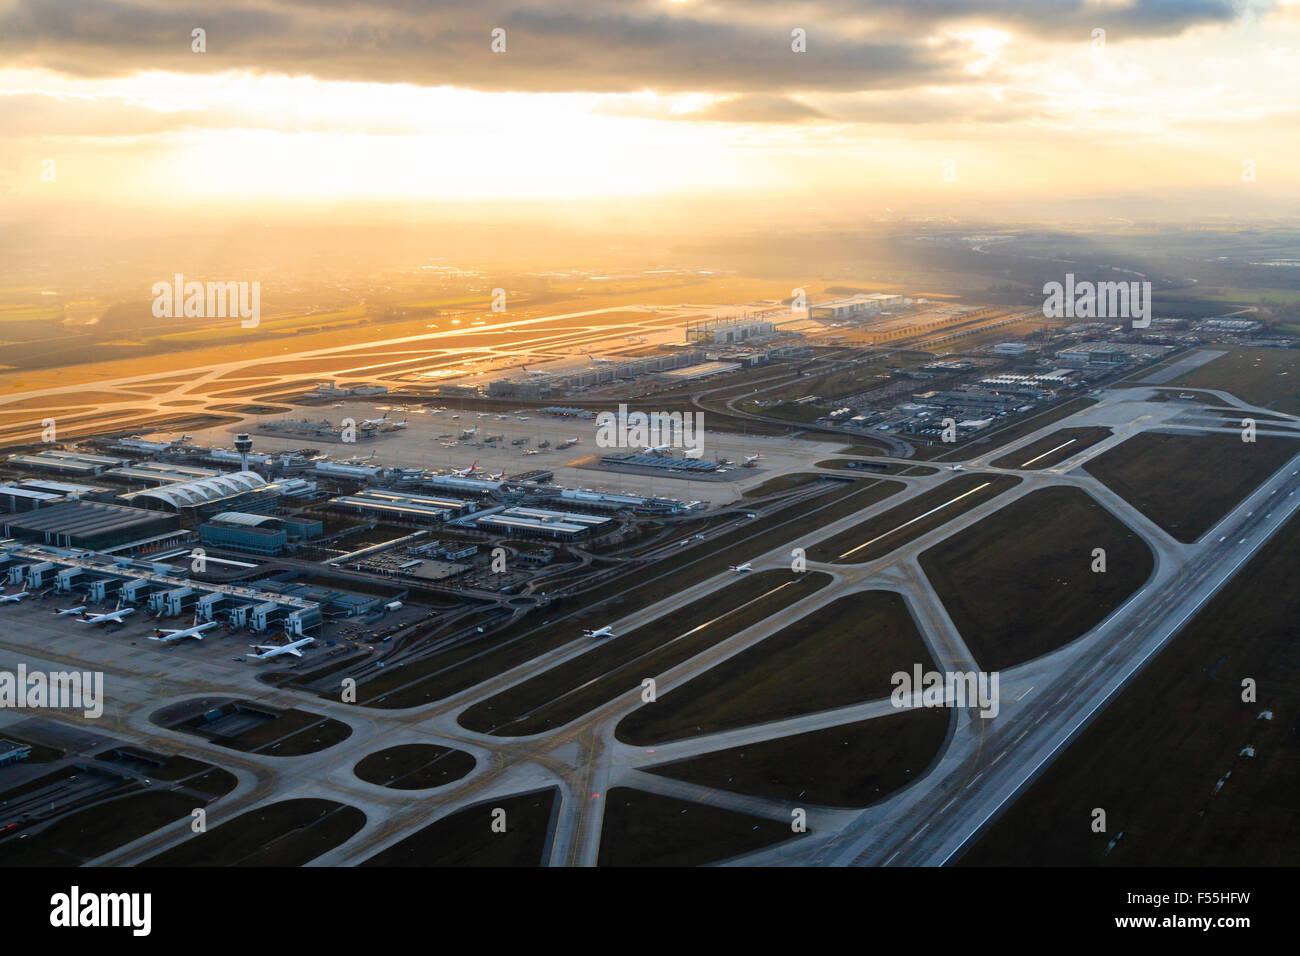 Gerany, Munich, Franz-Josef-Strauss International Airport Stock Photo